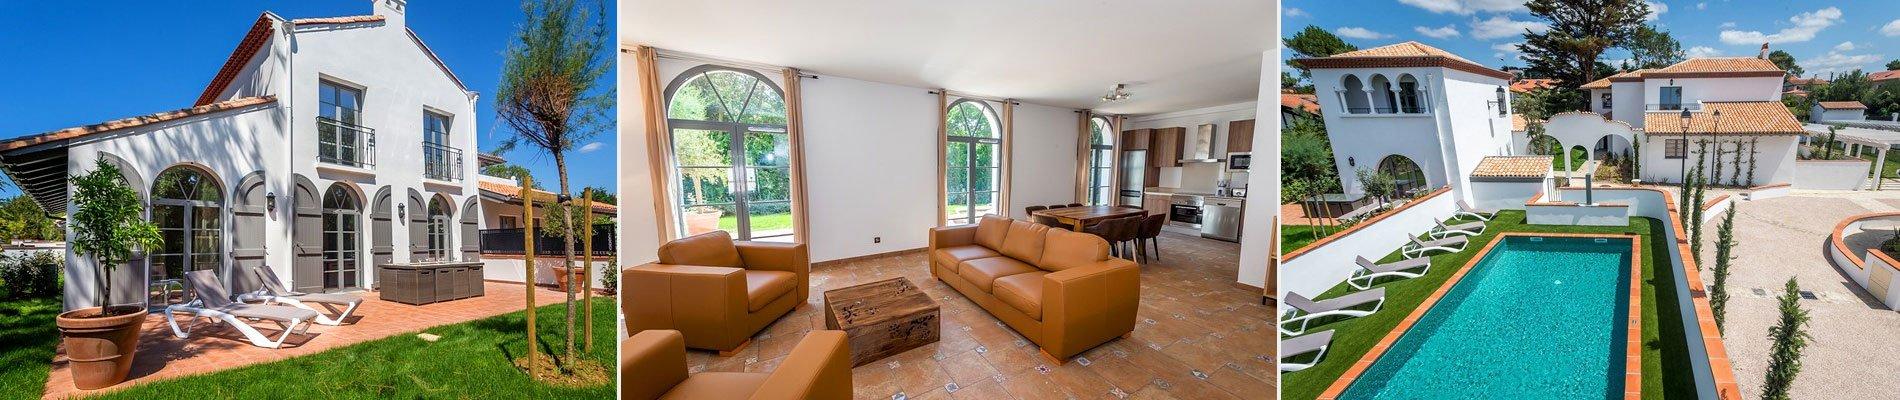 odalys-villas-milady-biarritz-frankrijk